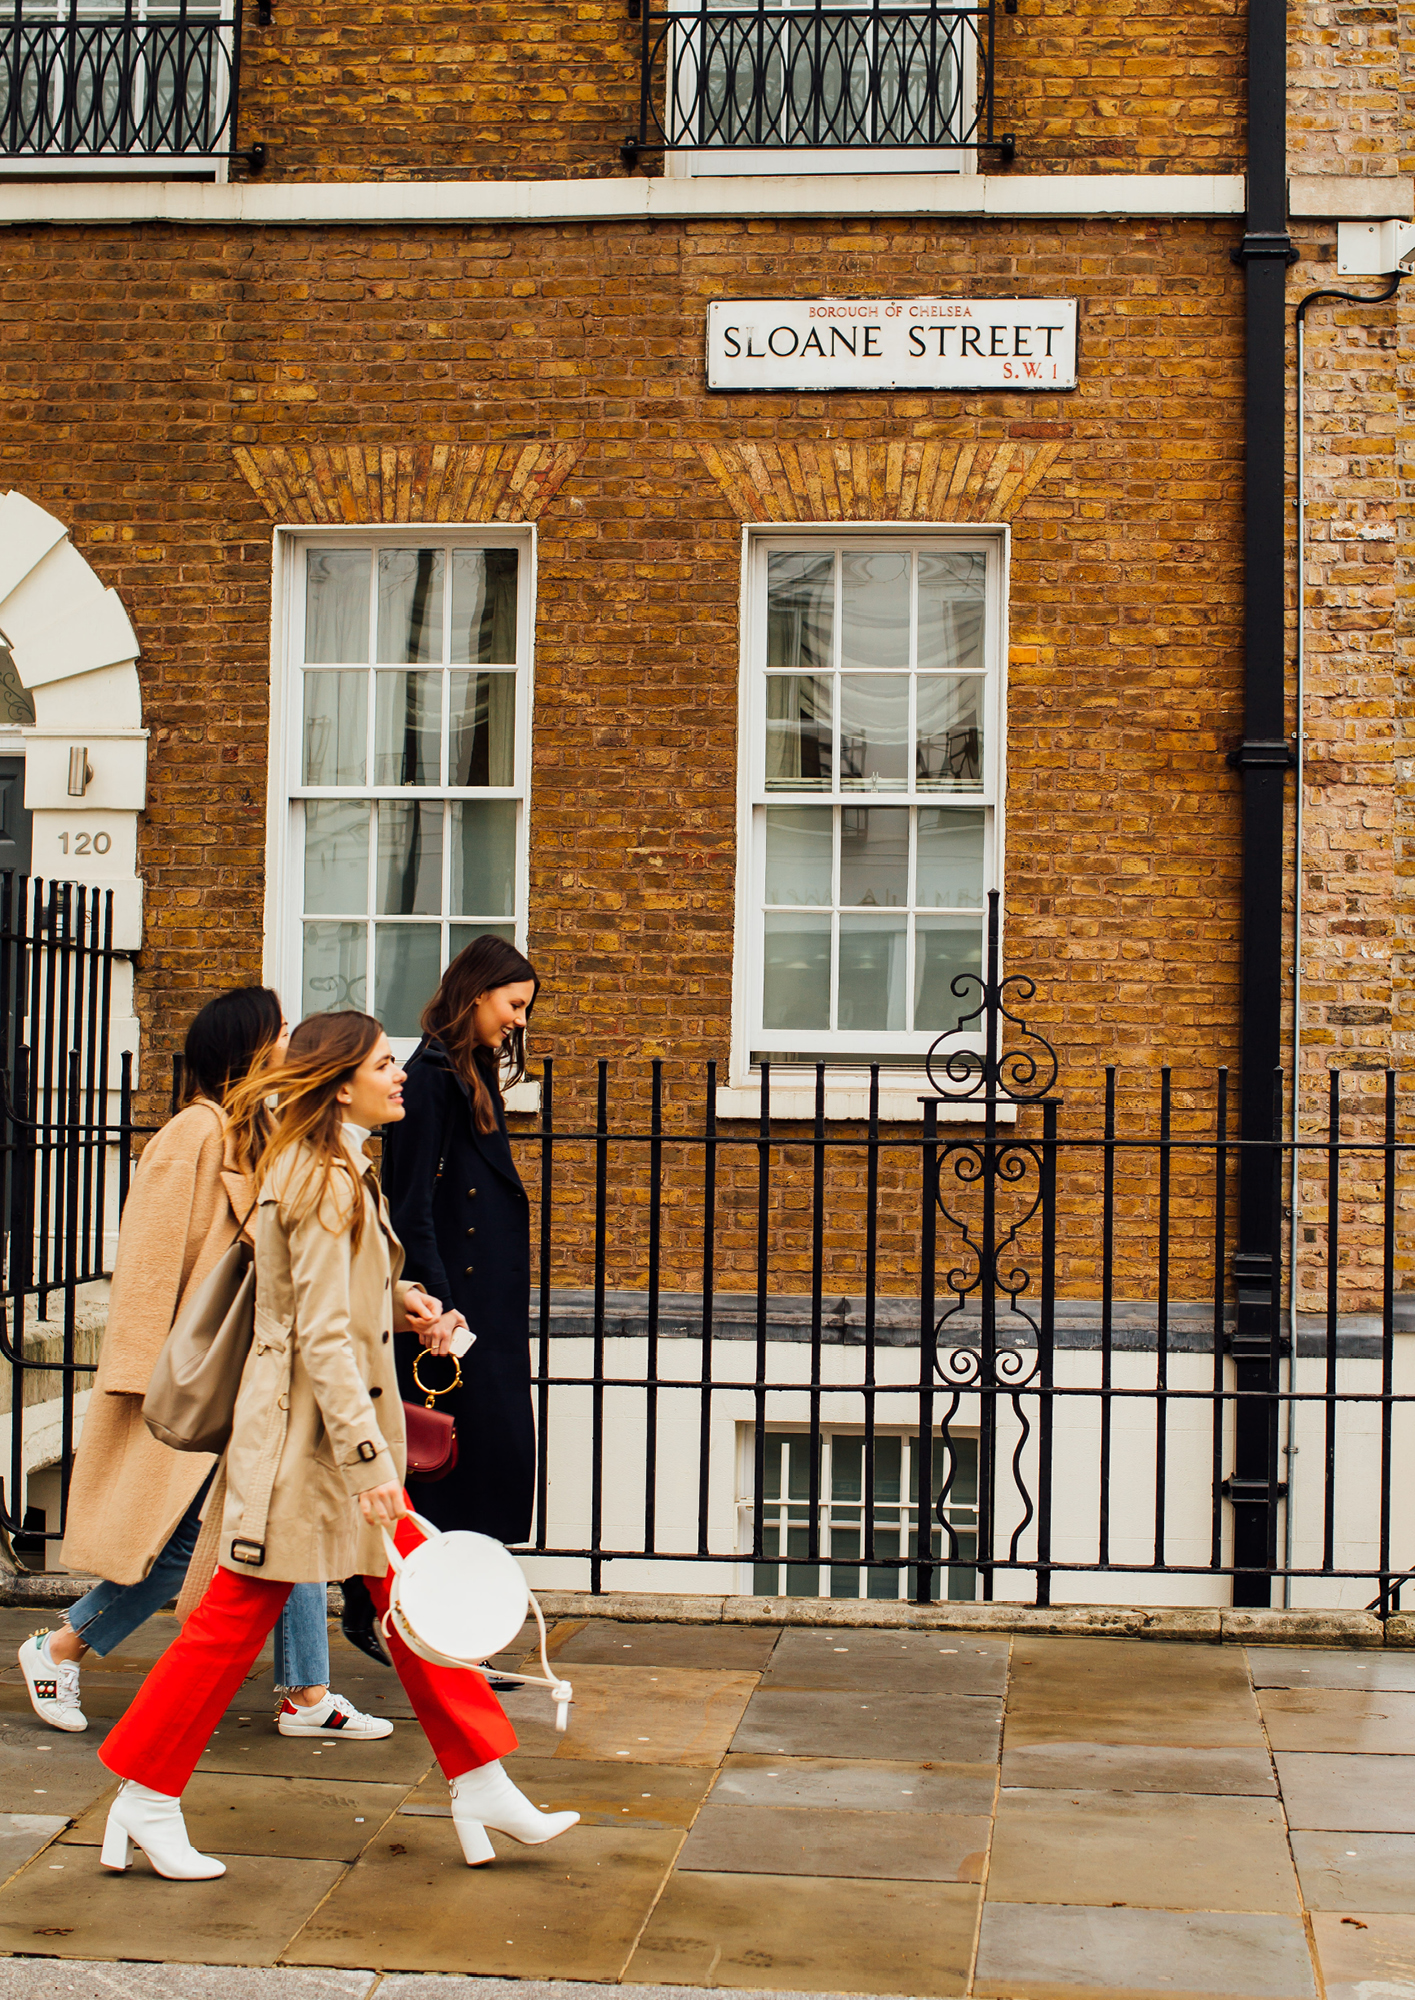 Sloane Street, London's finest shopping street